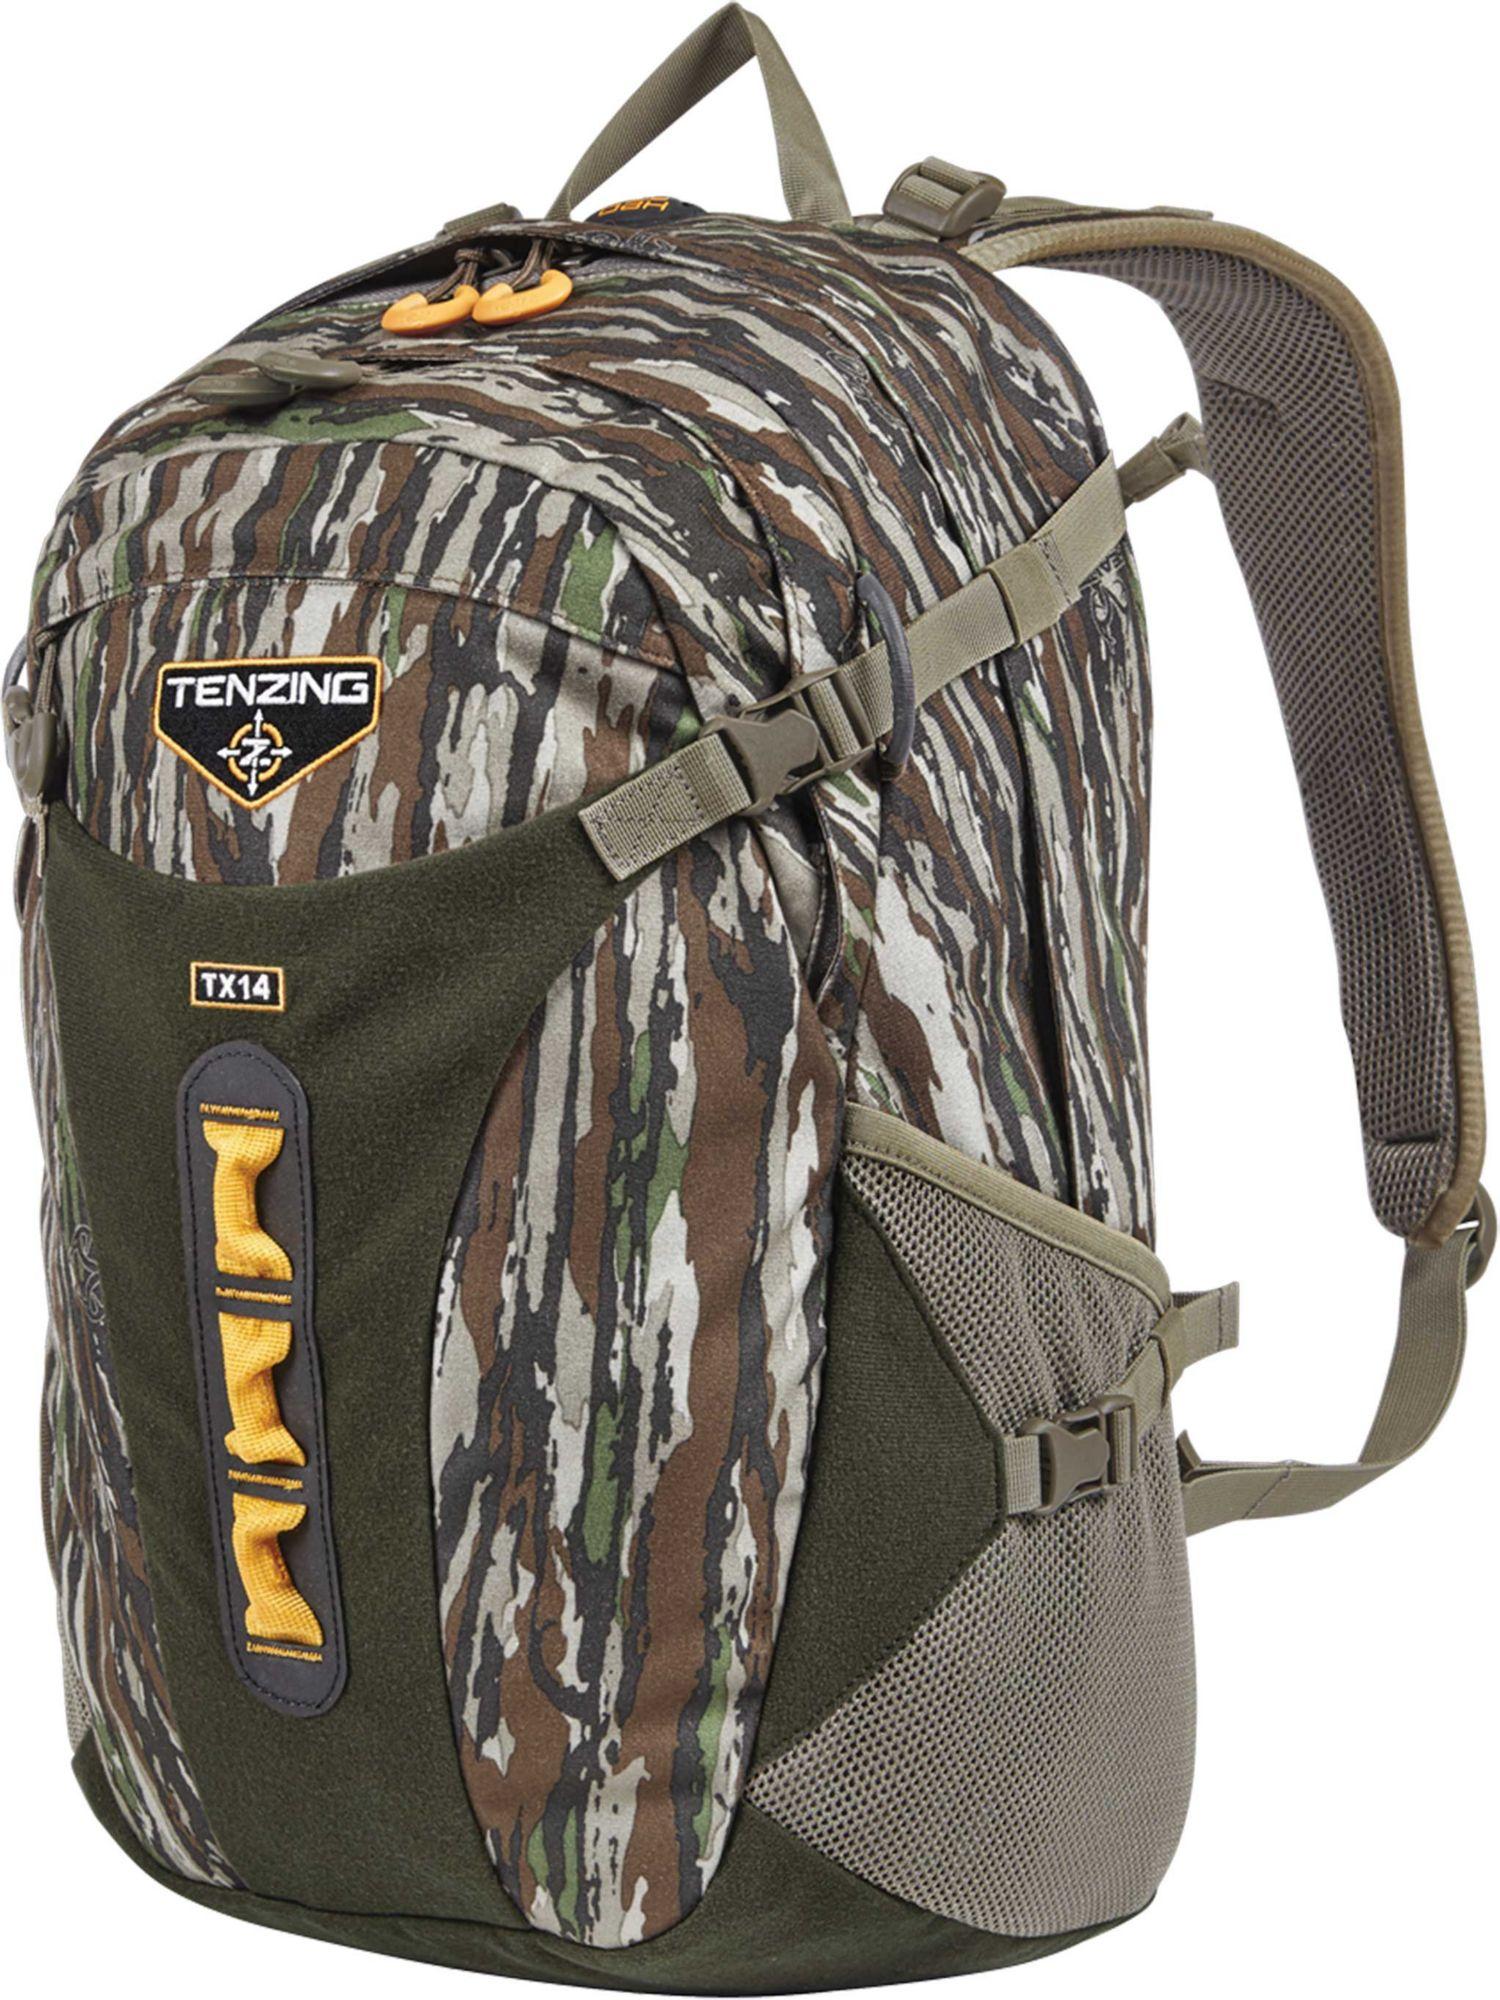 Hunting Backpacks \u0026 Waist Packs | Field \u0026 Stream